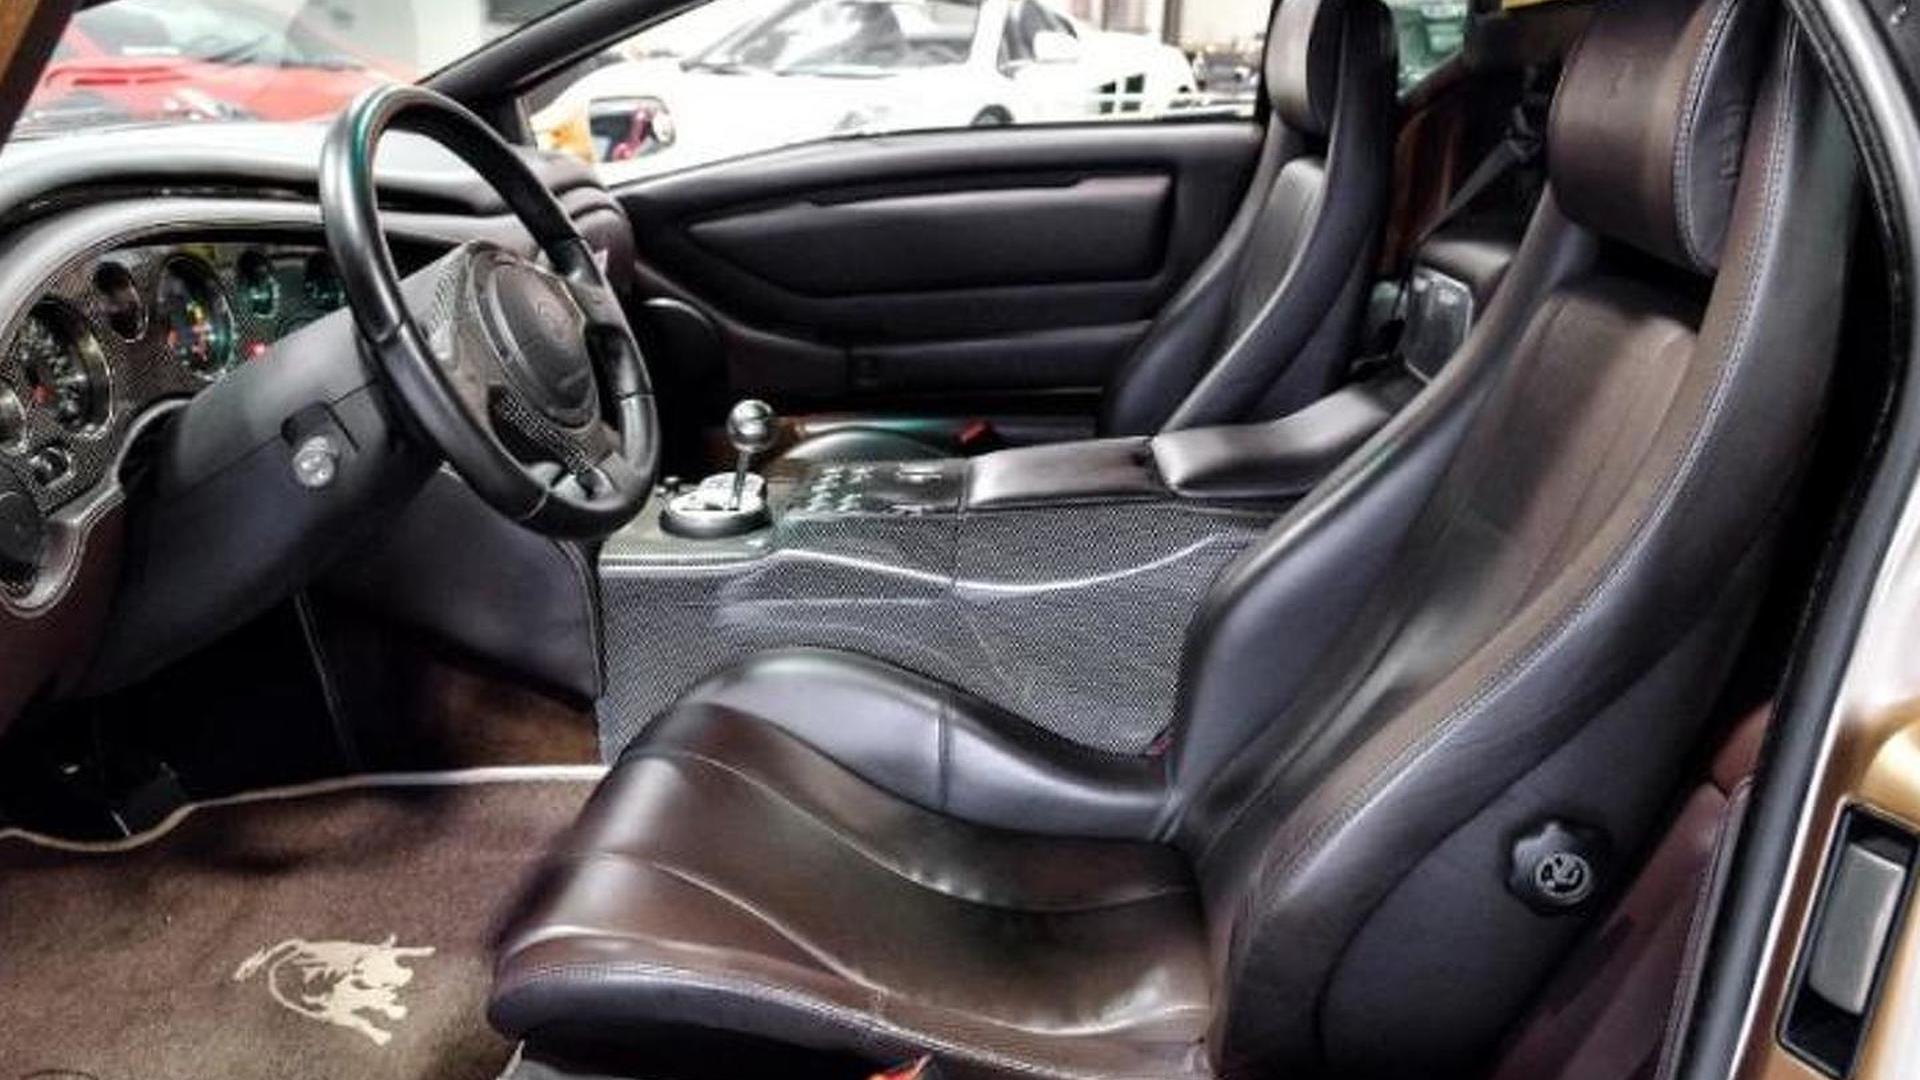 Сиденья-ковши в салоне Lamborghini Diablo 6.0 SE